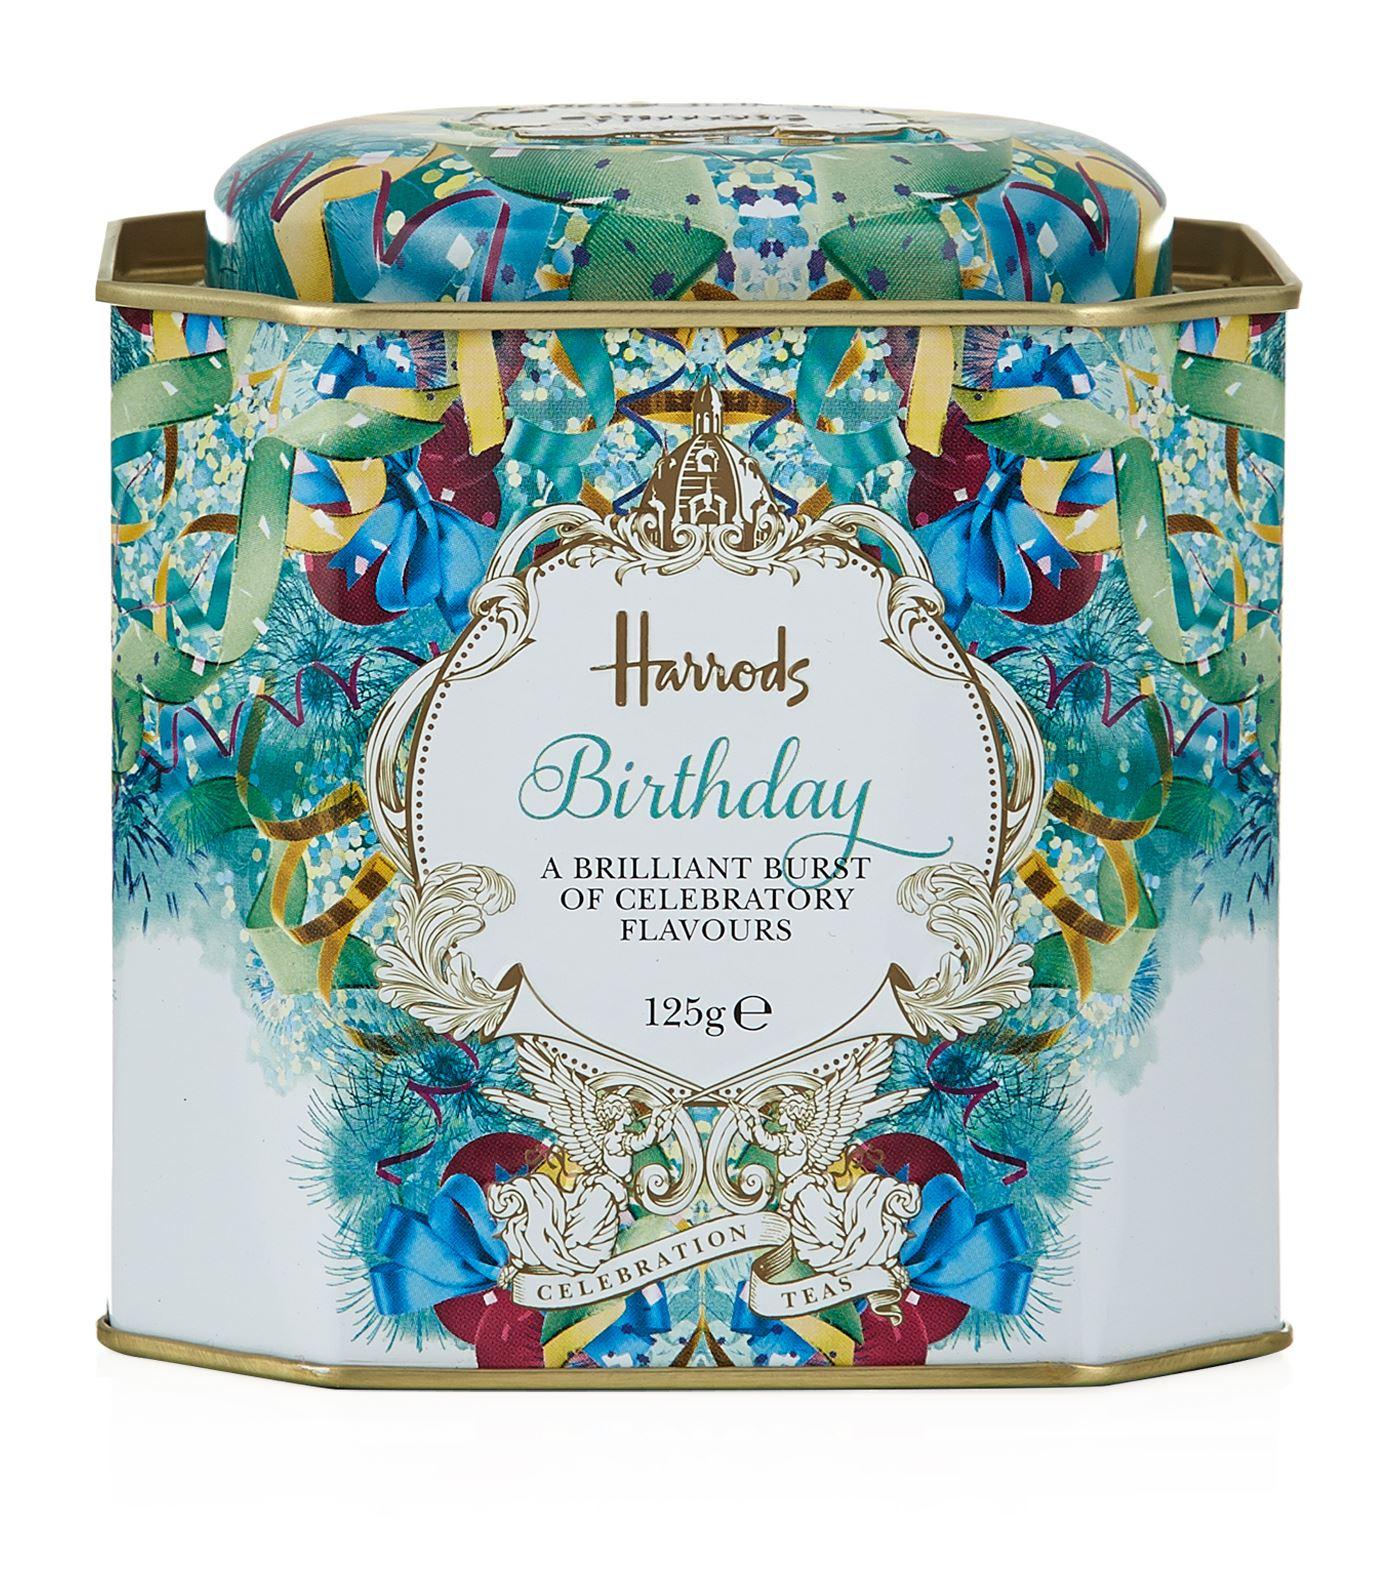 Harrods - Birthday Celebration Loose Leaf